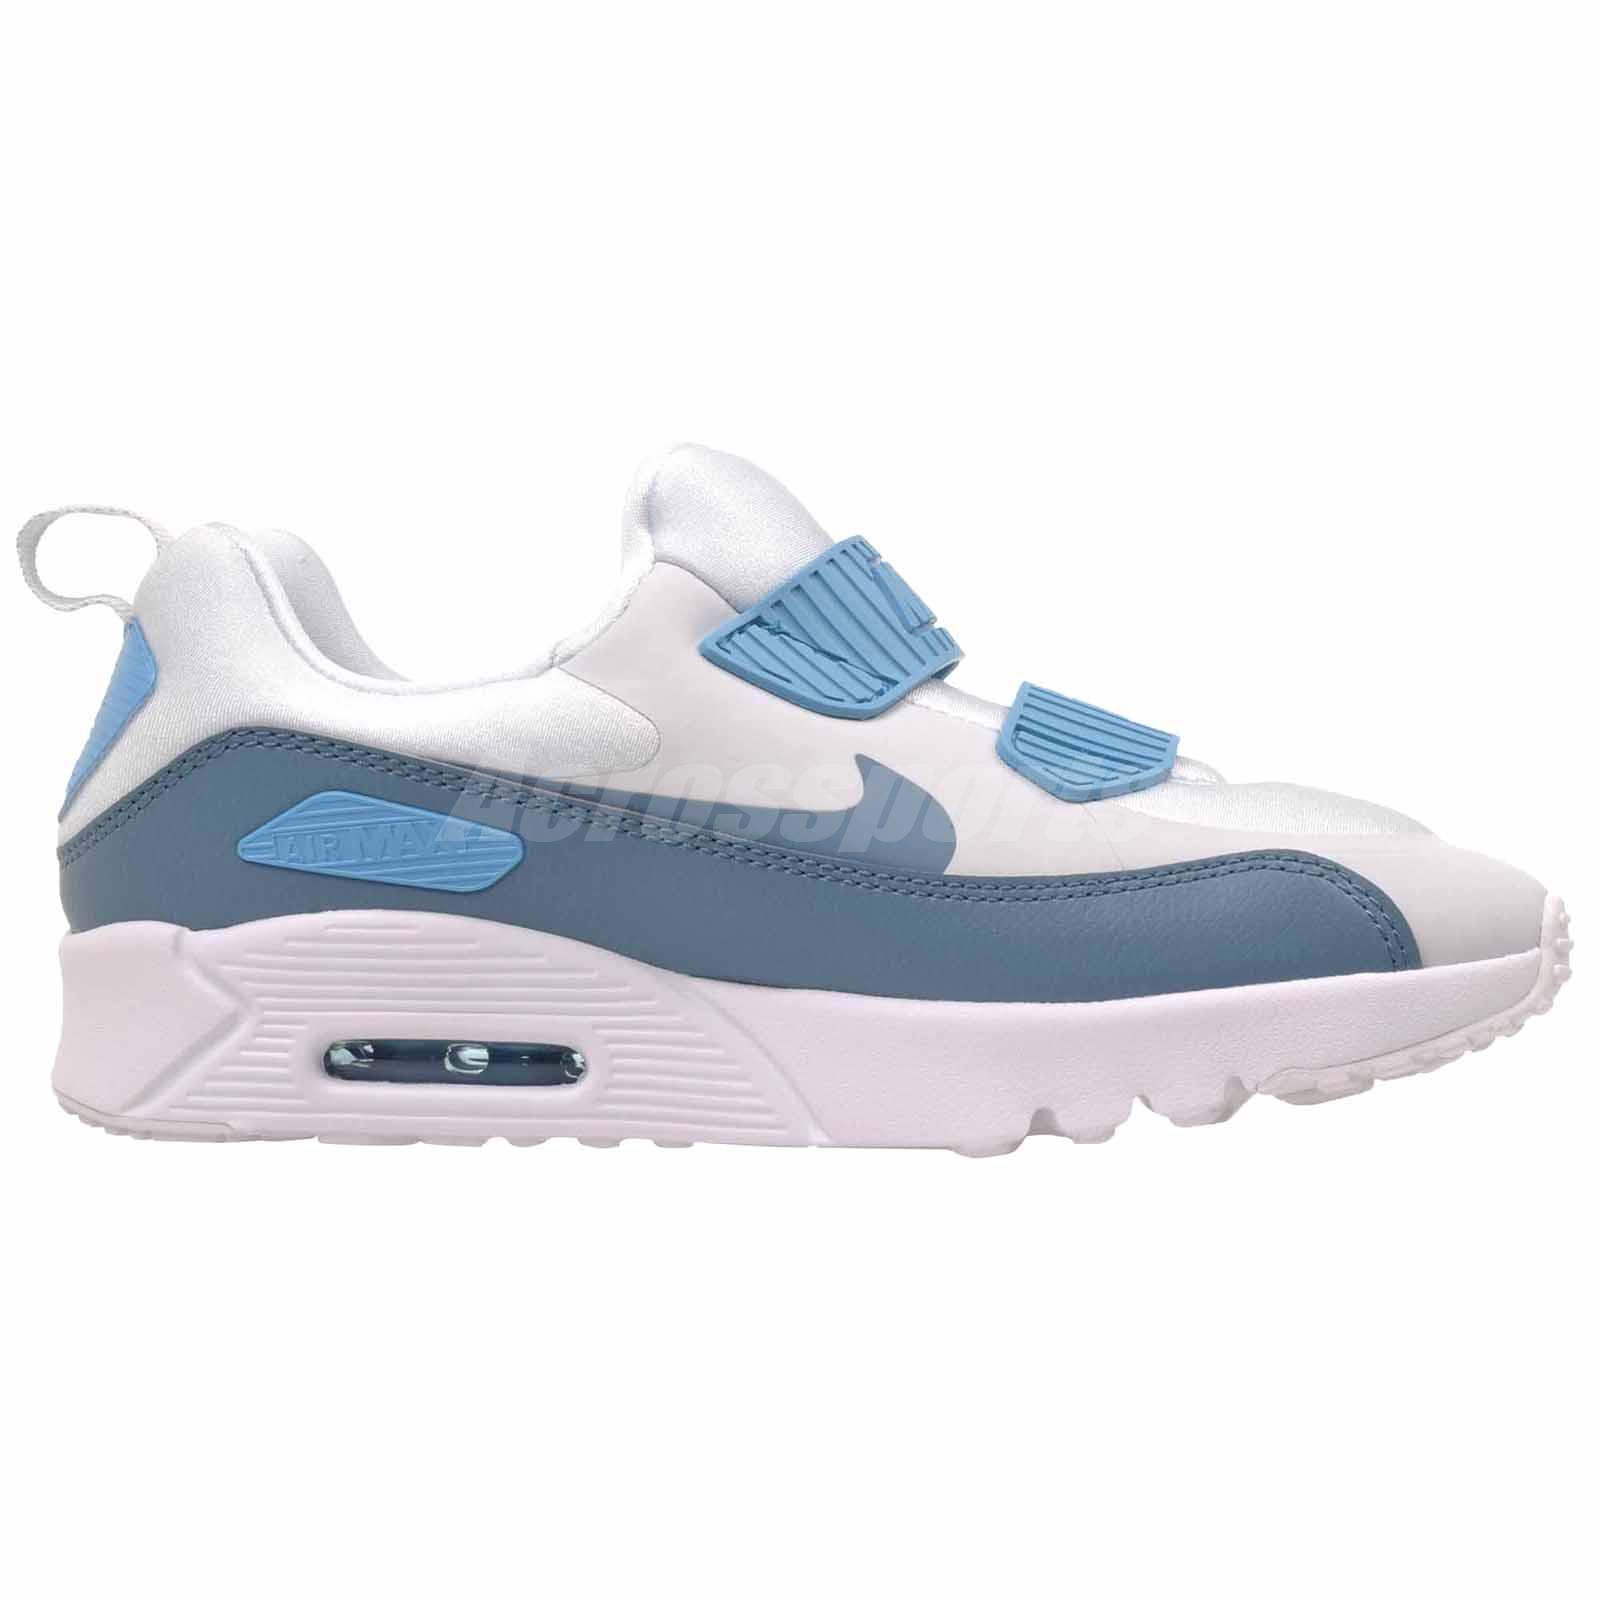 newest 0436e 42969 Nike Air Max Tiny 90 PS Preschool Kids Girls Boy Running Shoes ...